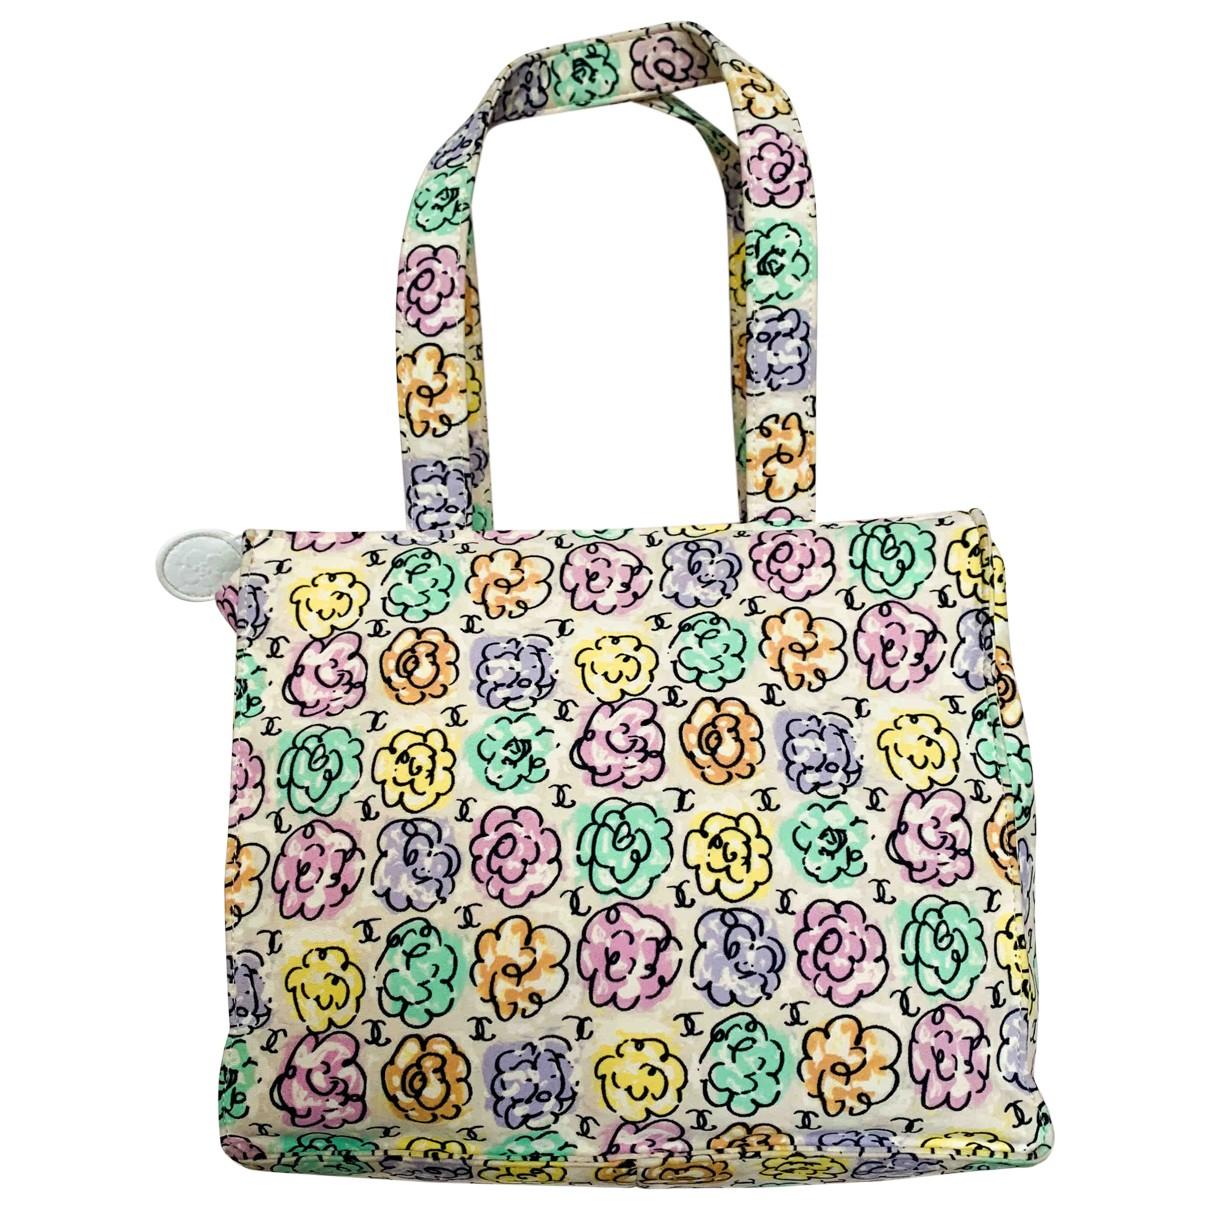 Chanel N Multicolour Cloth handbag for Women N